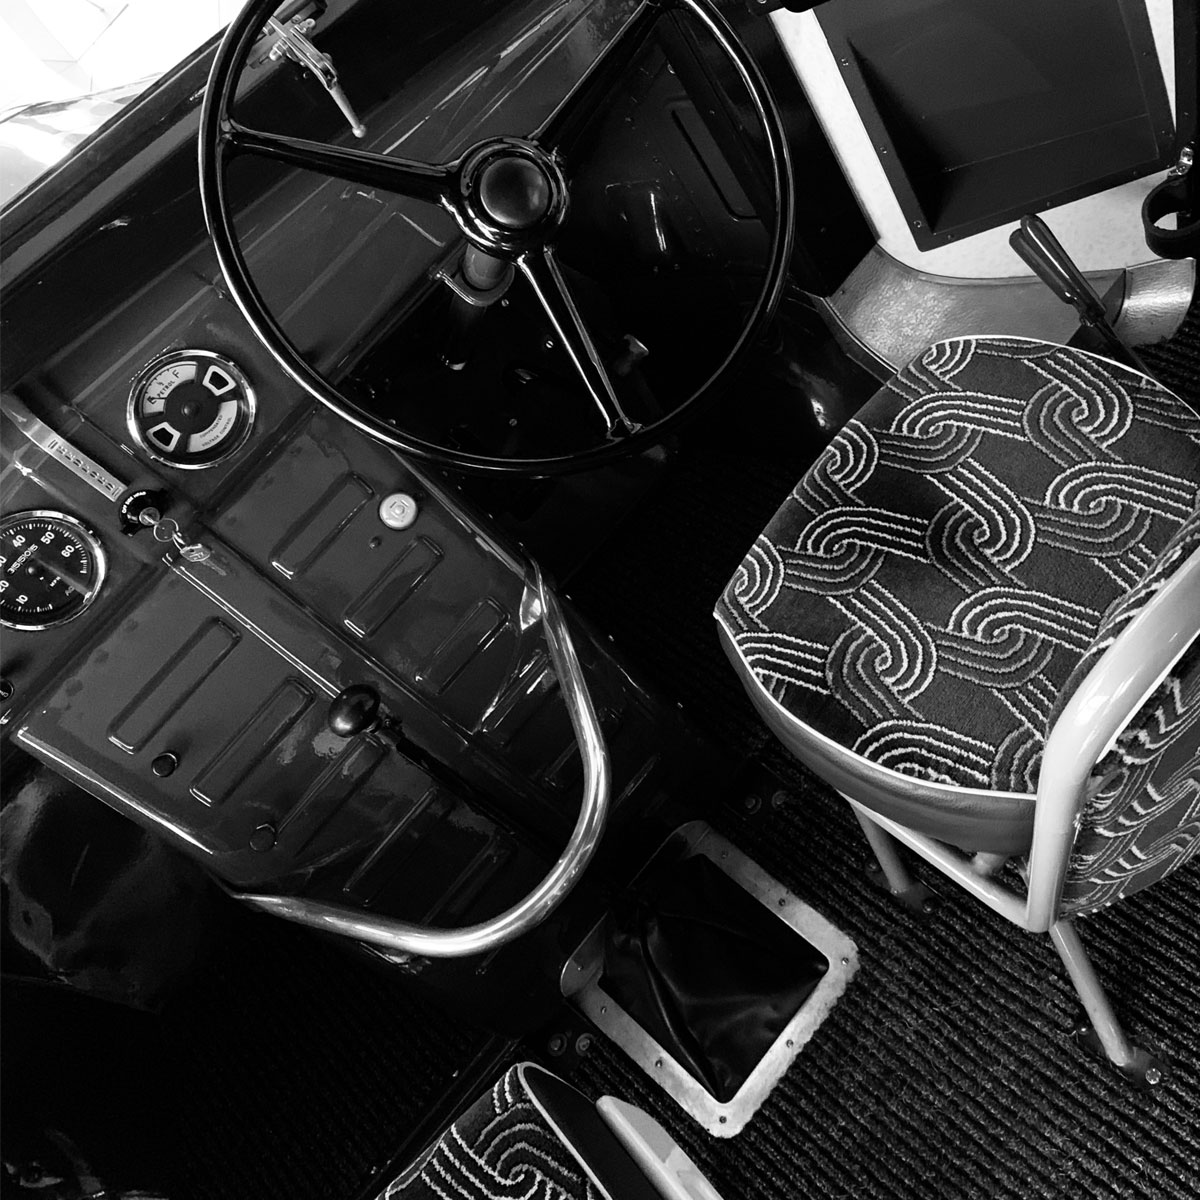 heritage-slider-dash